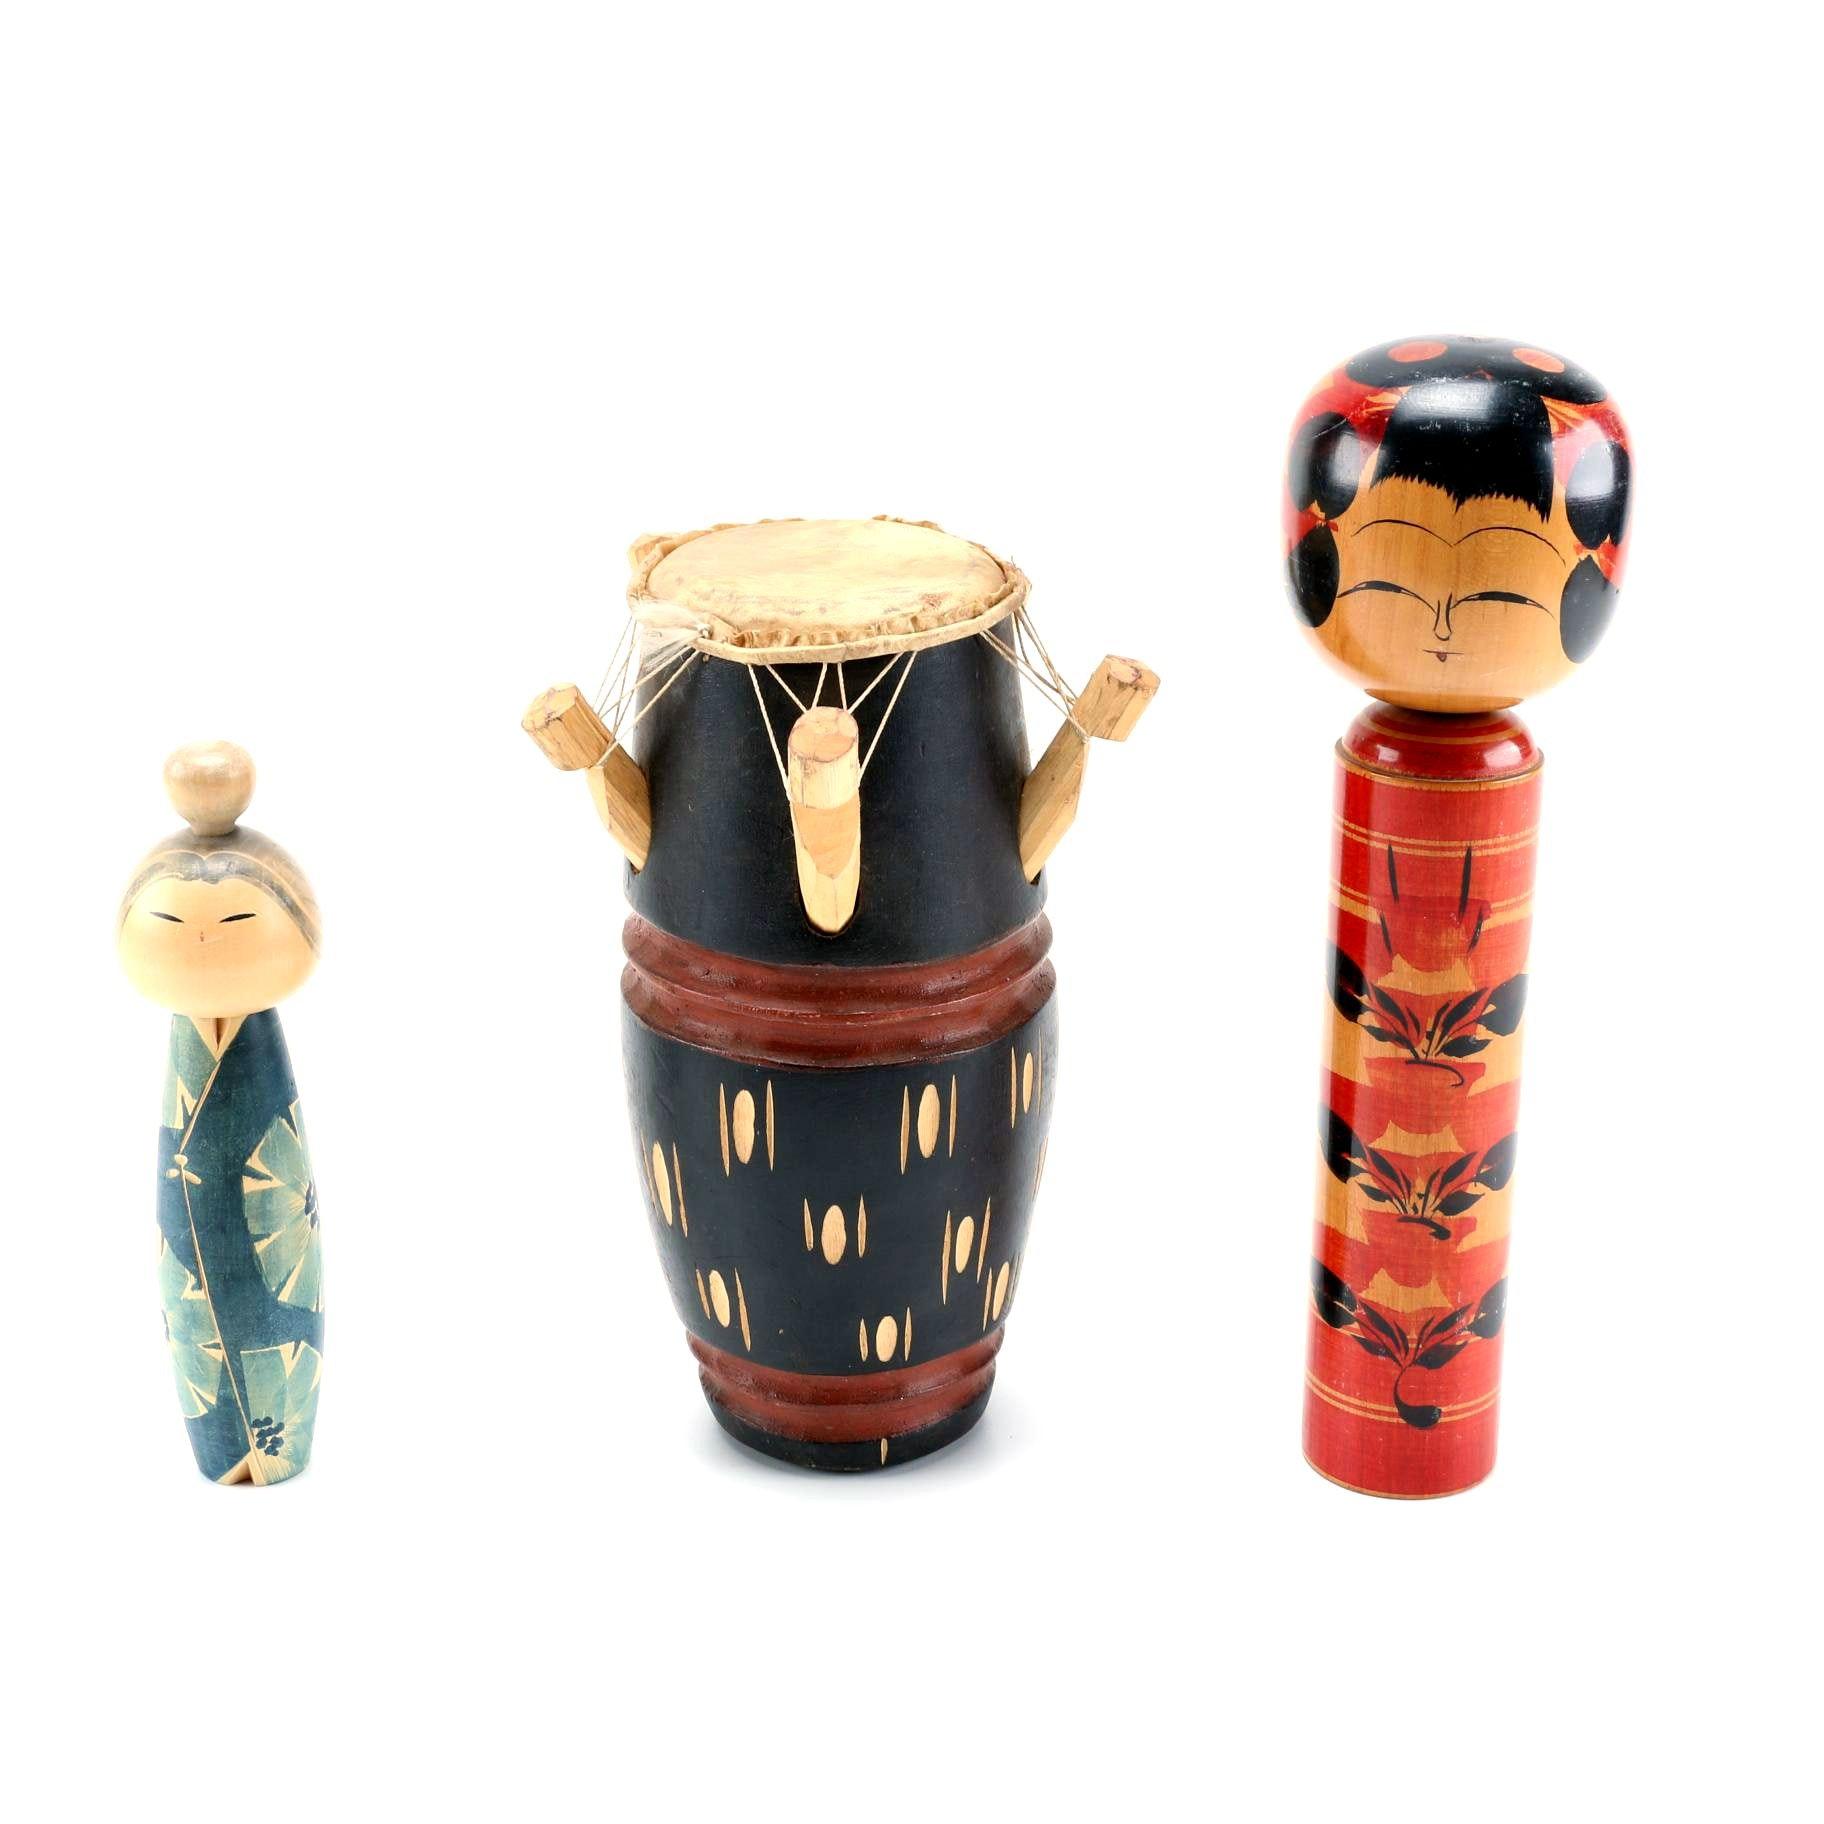 Japanese Kokeshi Dolls and a Kpanlogo Drum